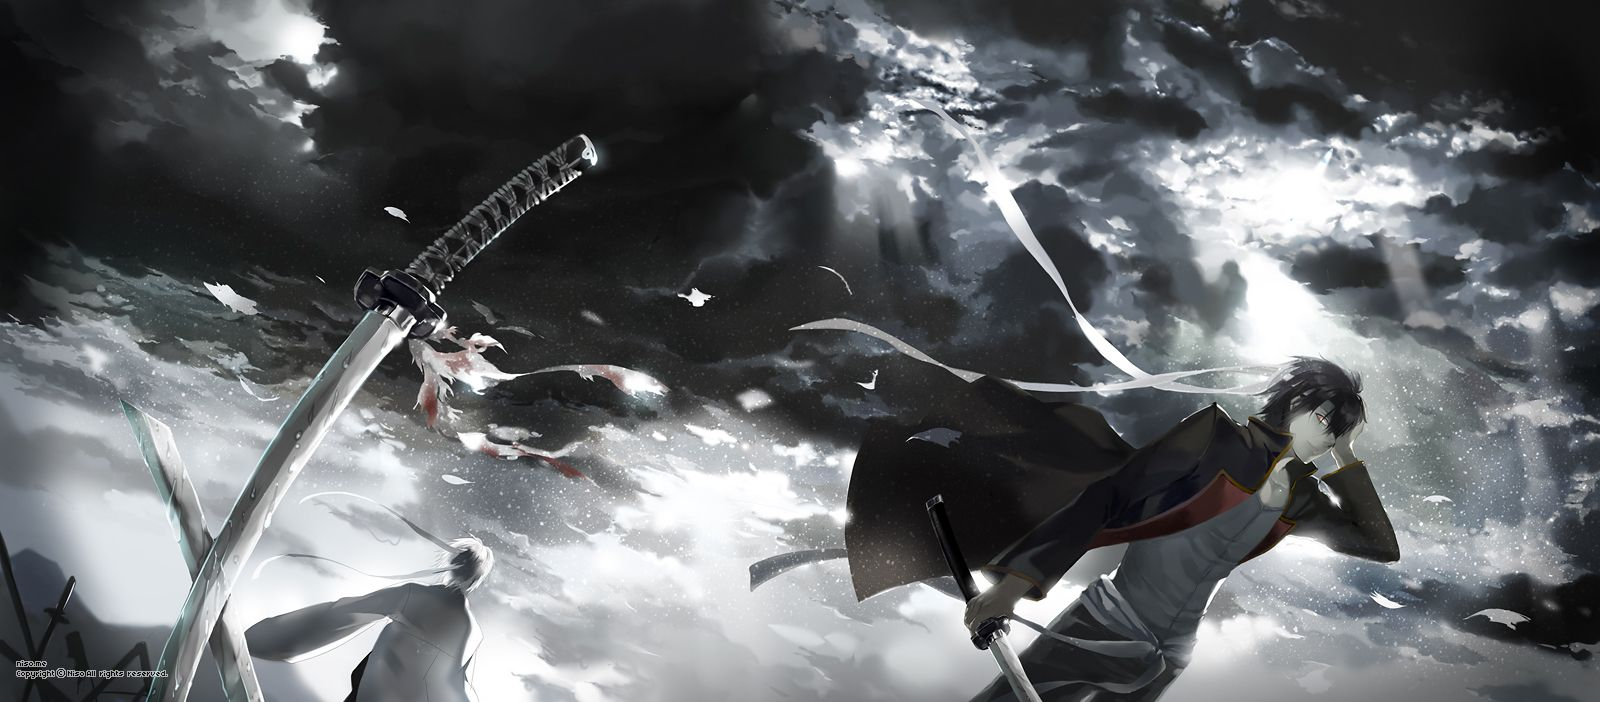 Gintoki Takasugi 高杉晋助 銀魂 イラスト 四天王